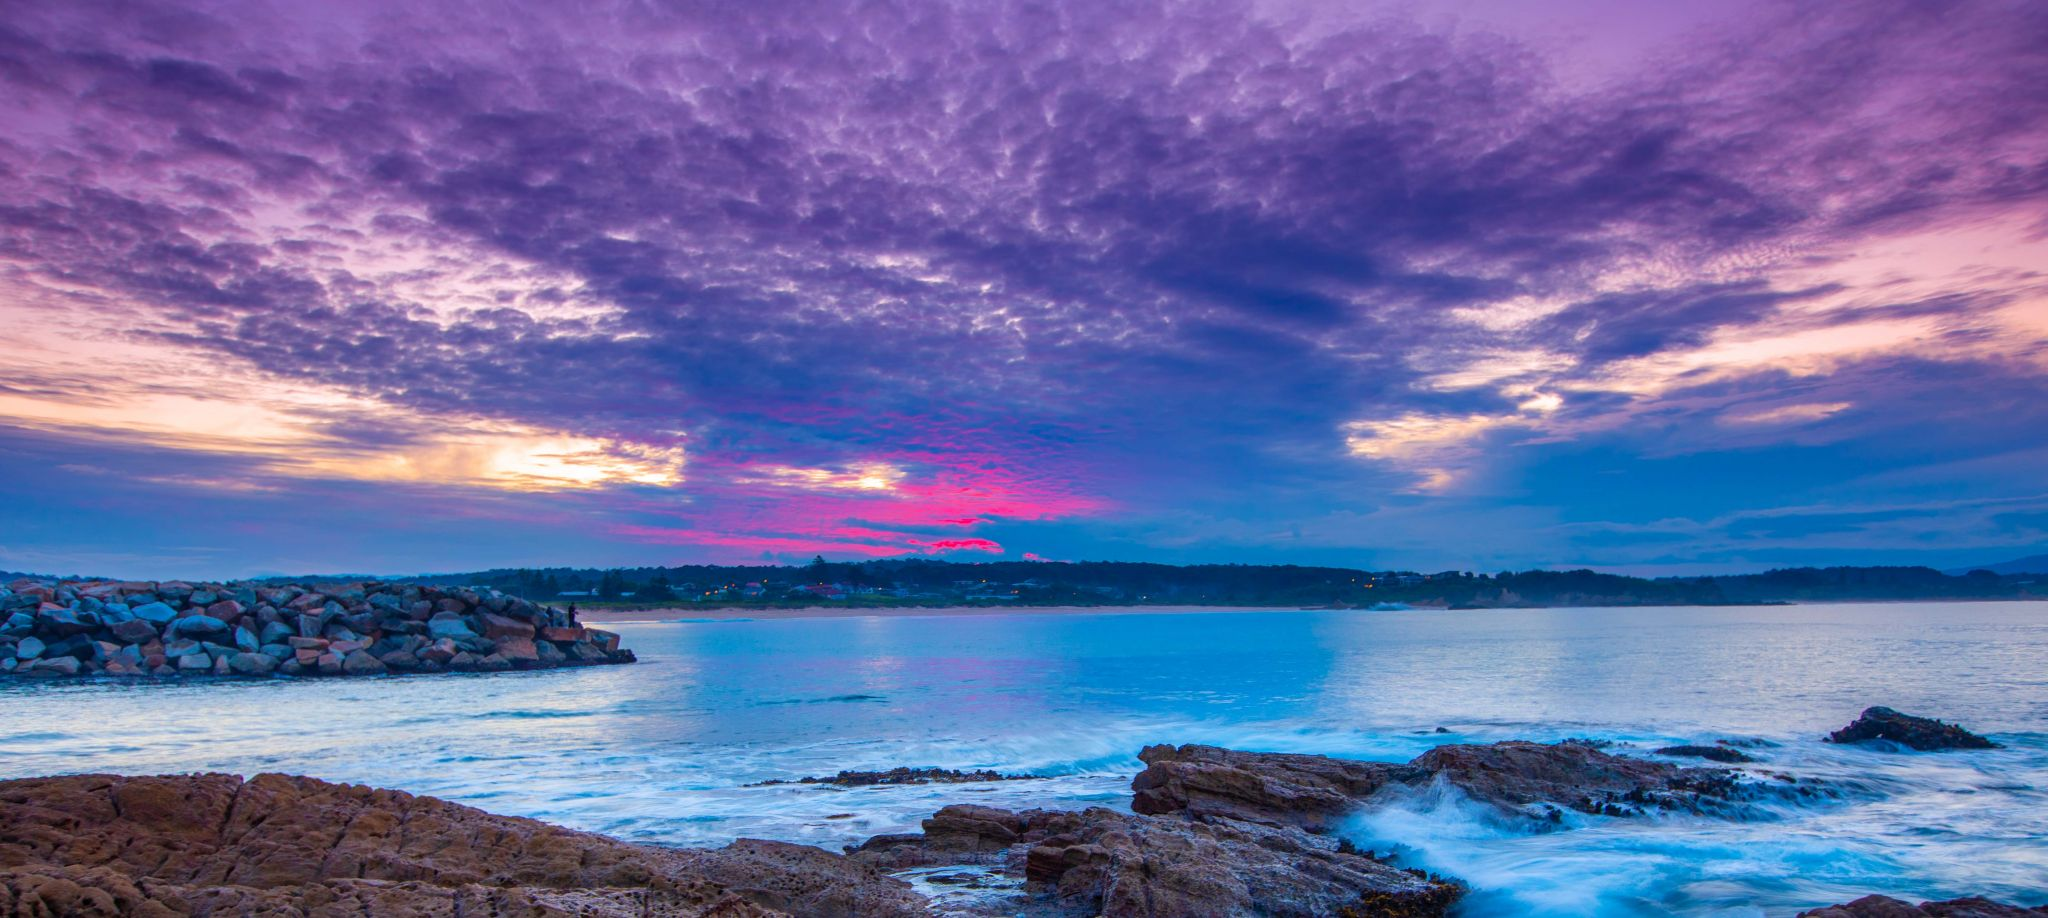 Bermagui Breakwater, New South Wales sunset, Australia